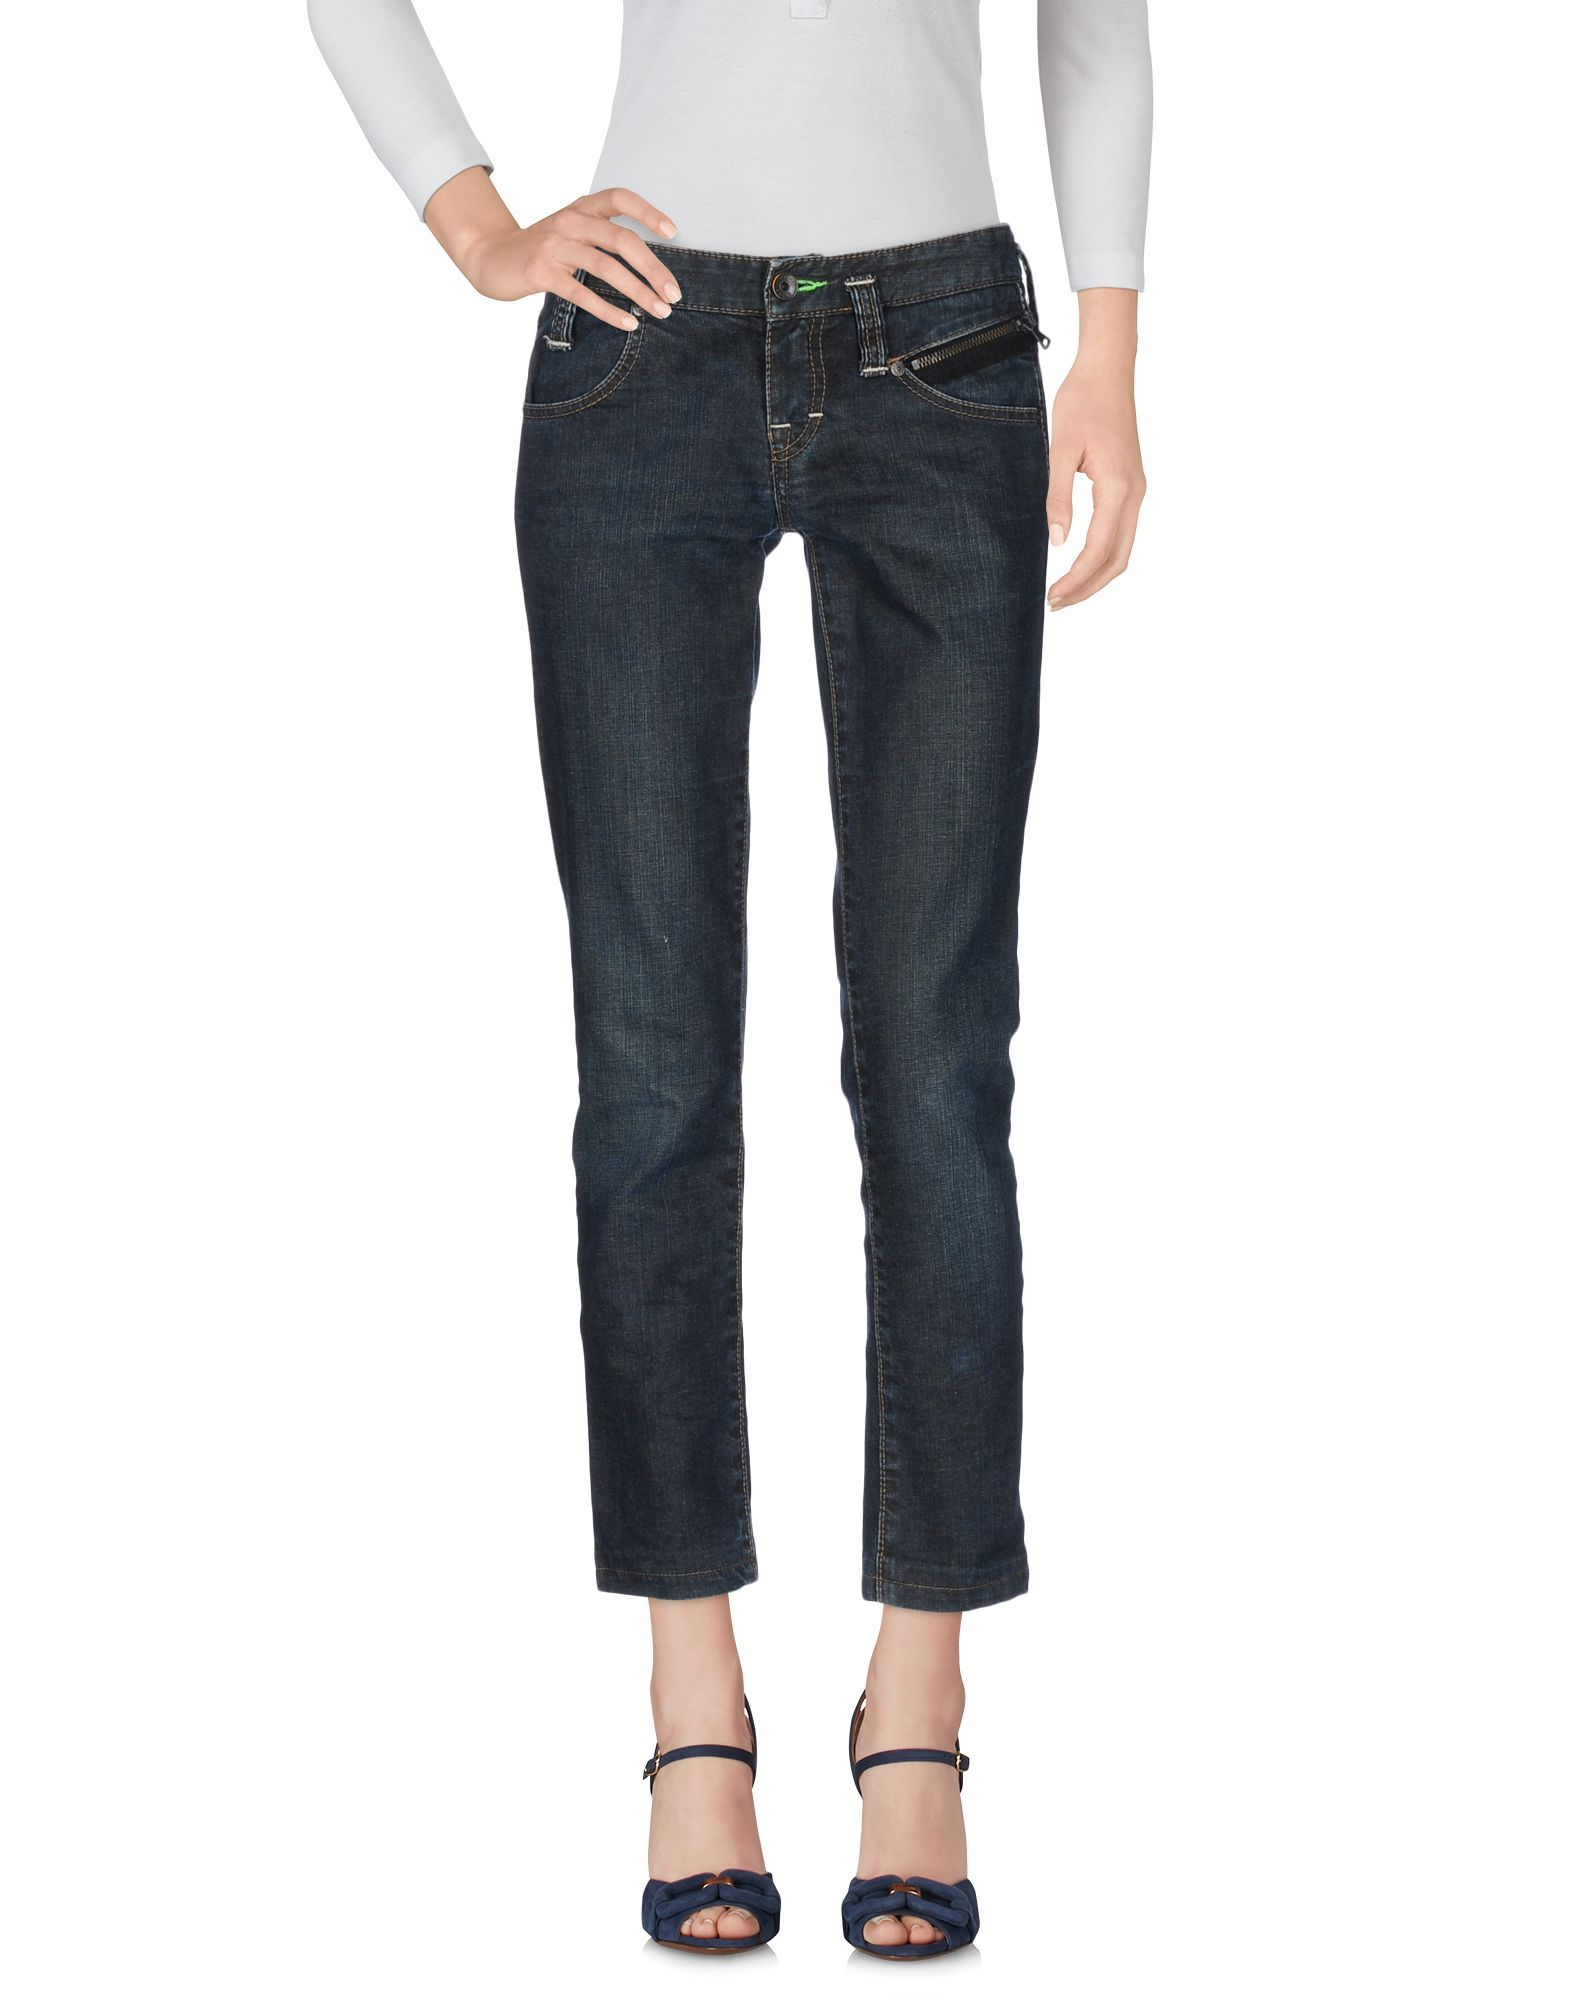 BOSS ORANGE Damen Jeanshose Farbe Blau Größe 3 - broschei